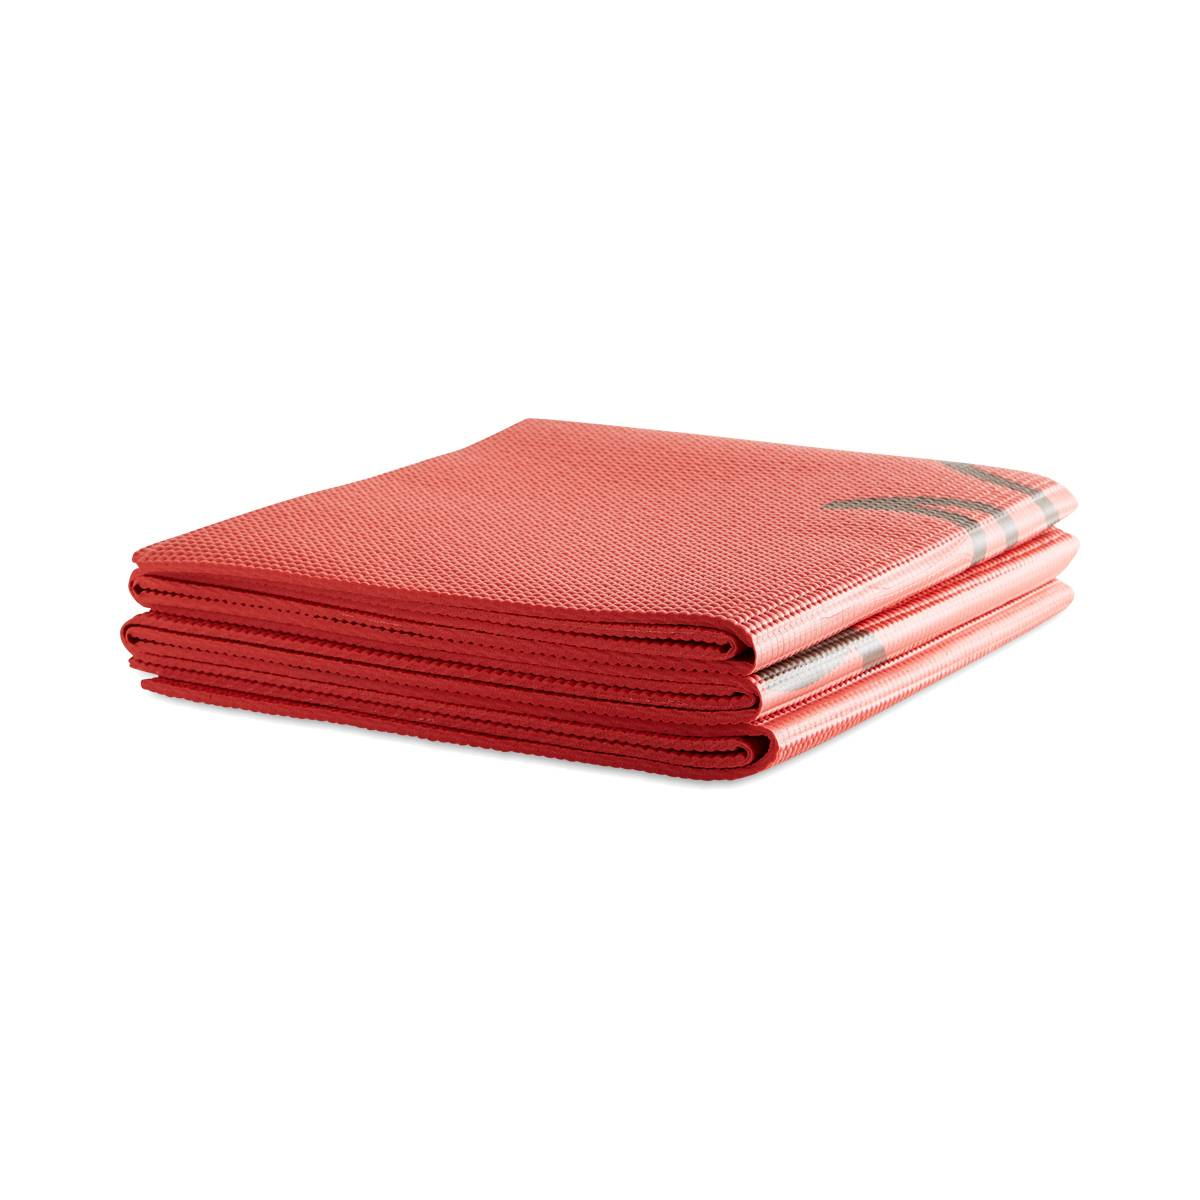 ROAM Folding Yoga Mat By Natural Fitness